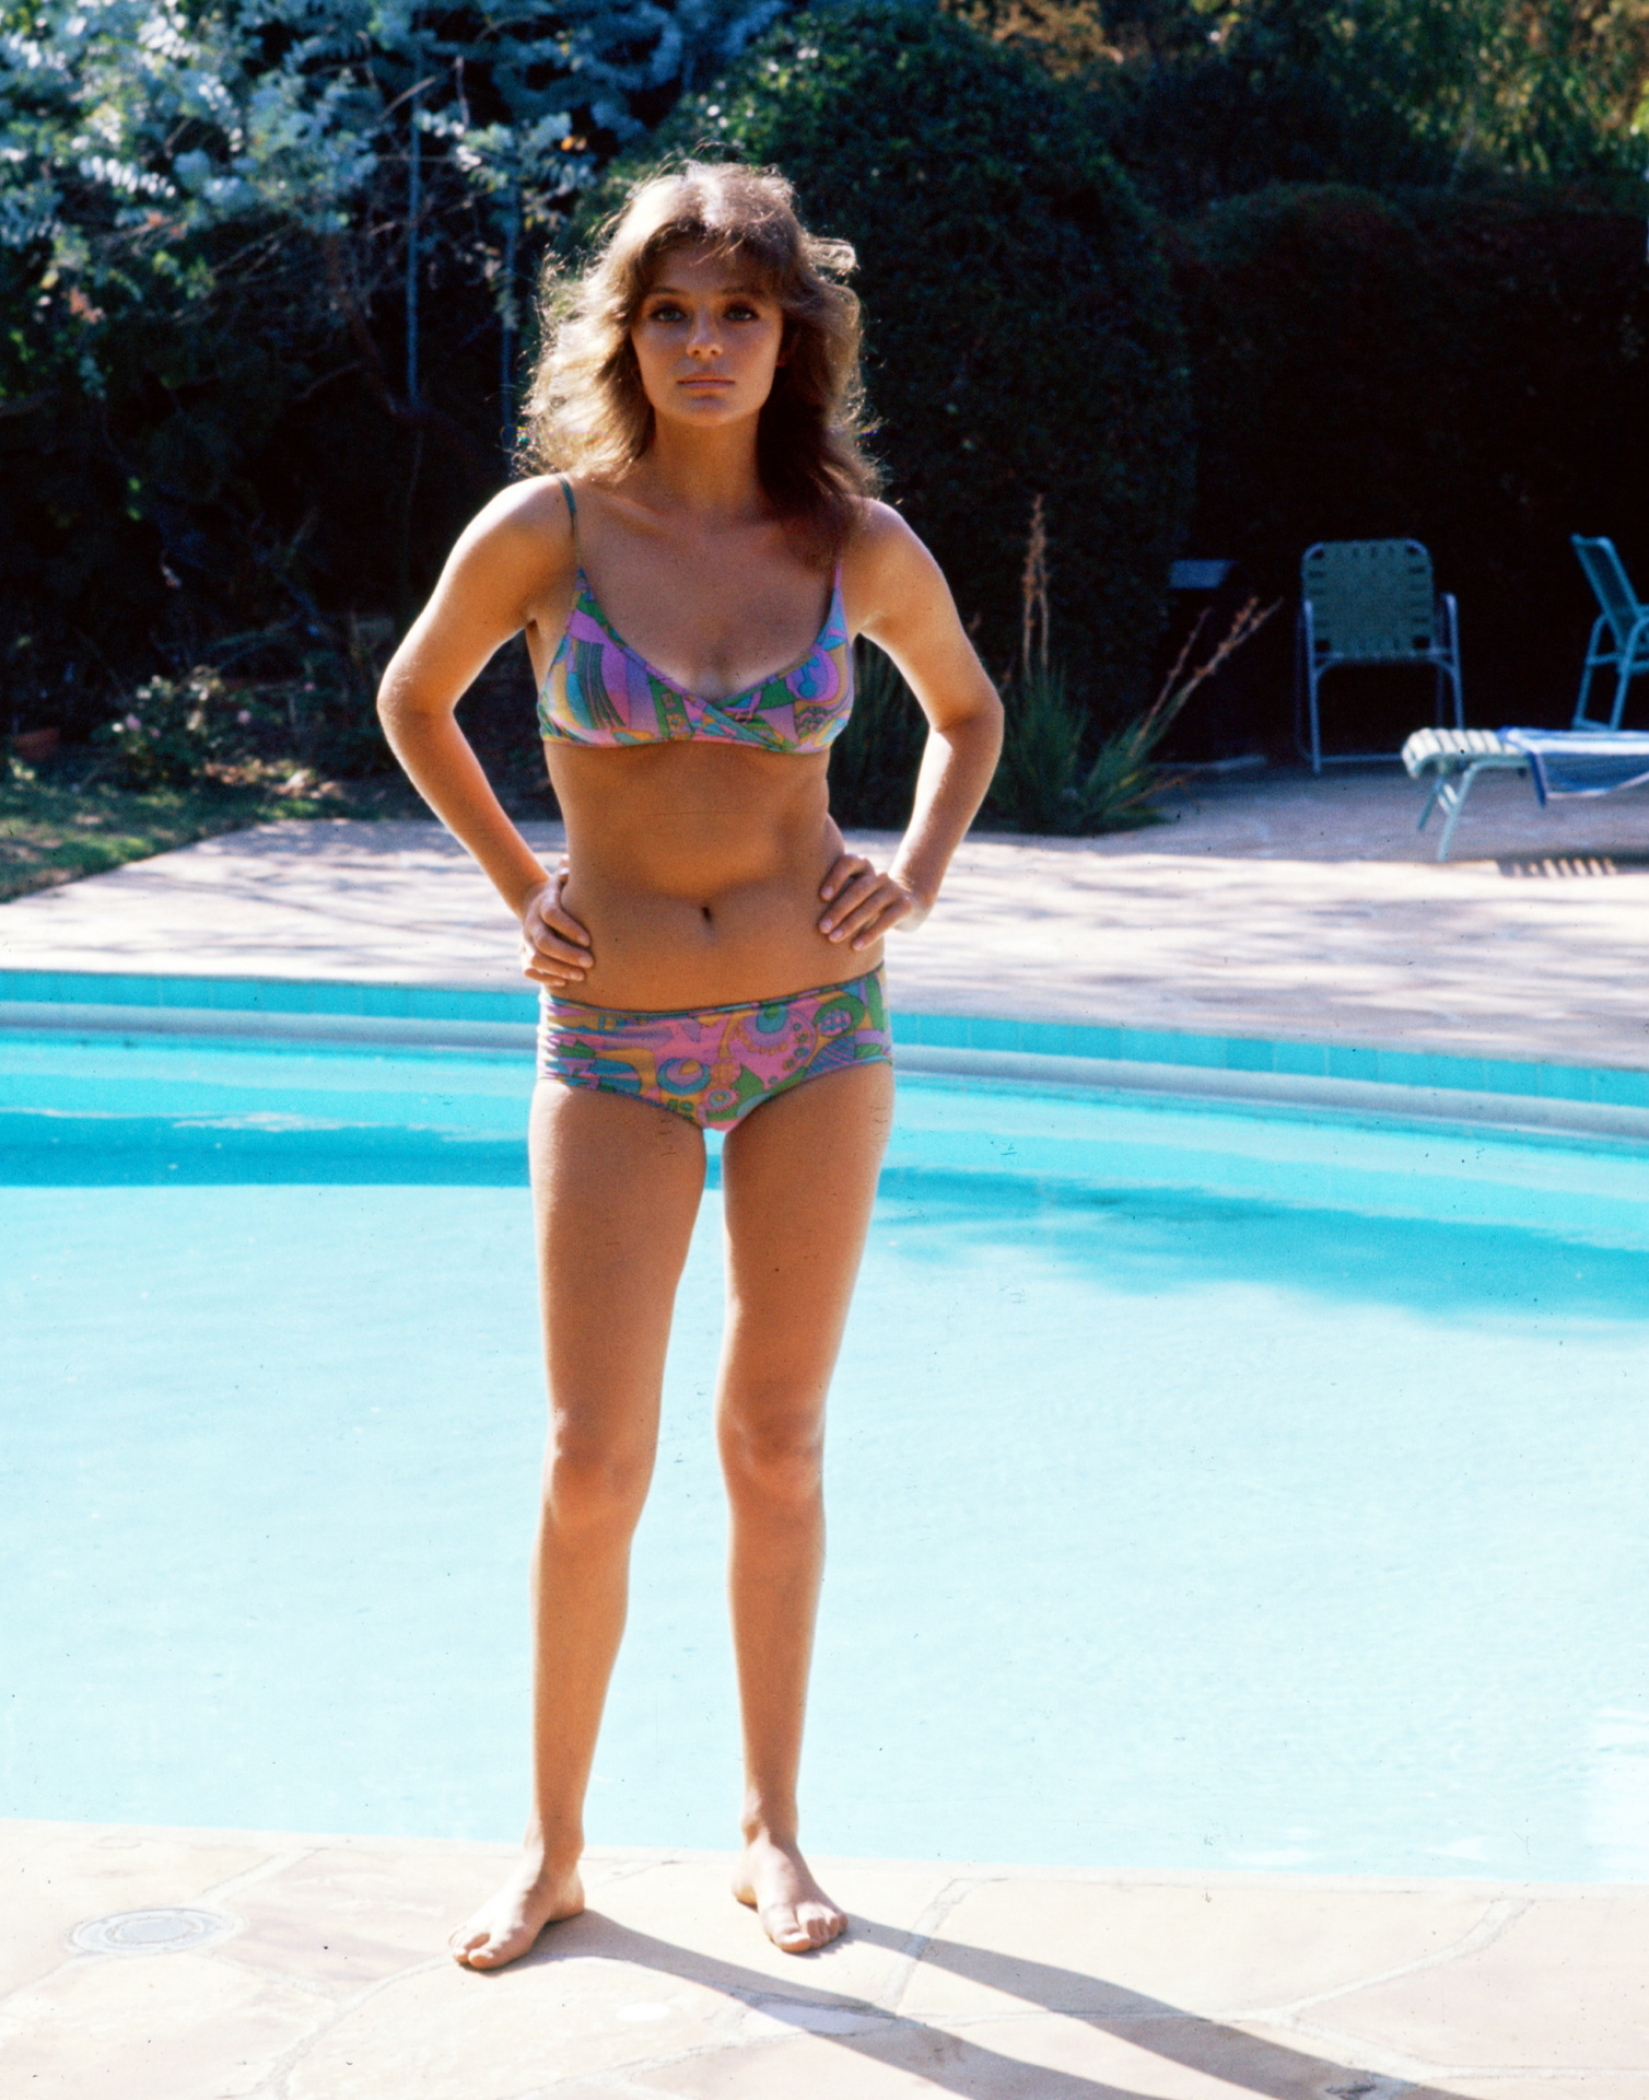 Bikini jaqueline bisset